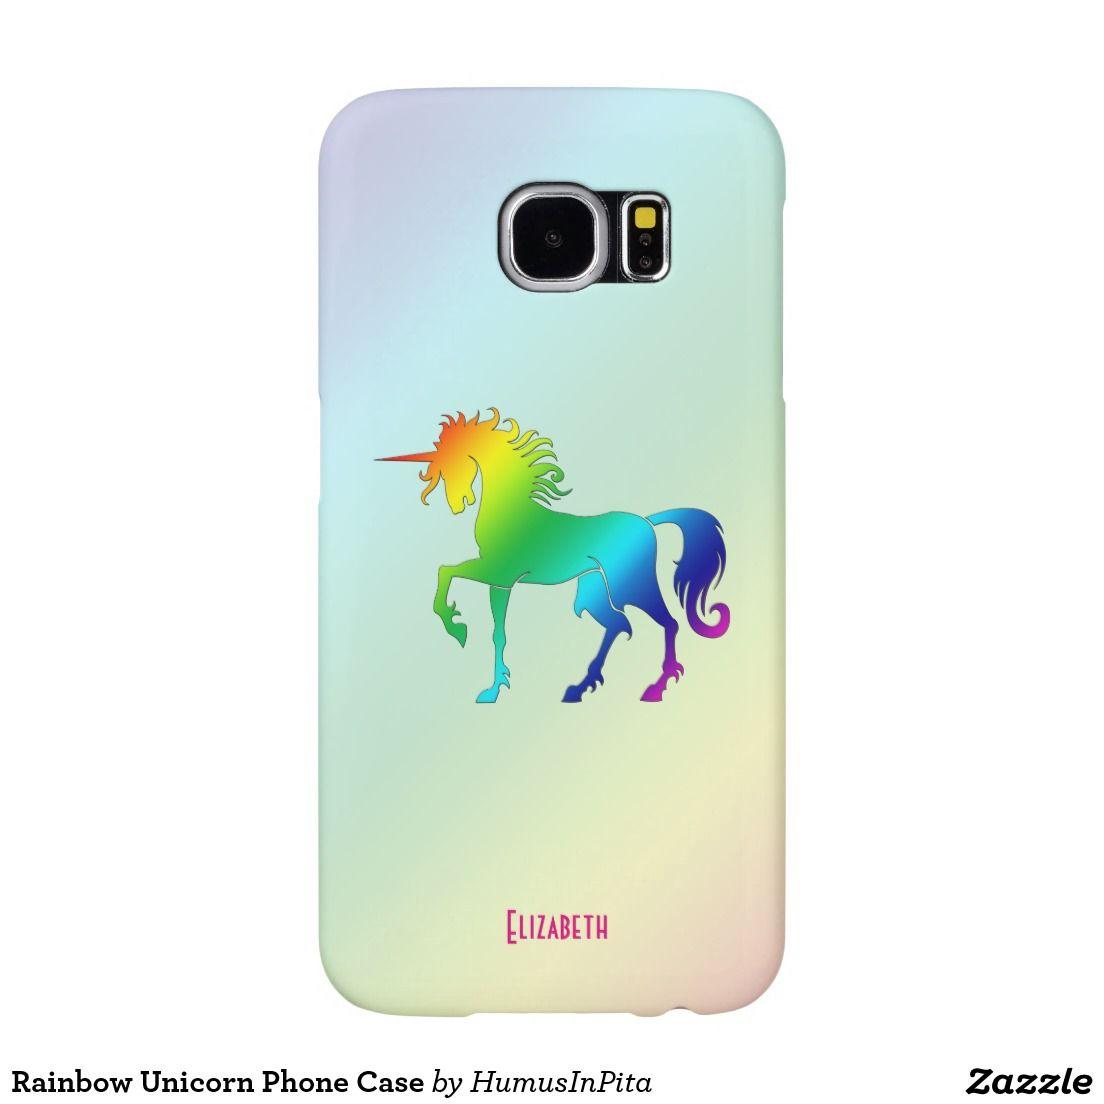 Rainbow Unicorn Phone Case Samsung Galaxy S6 Cases